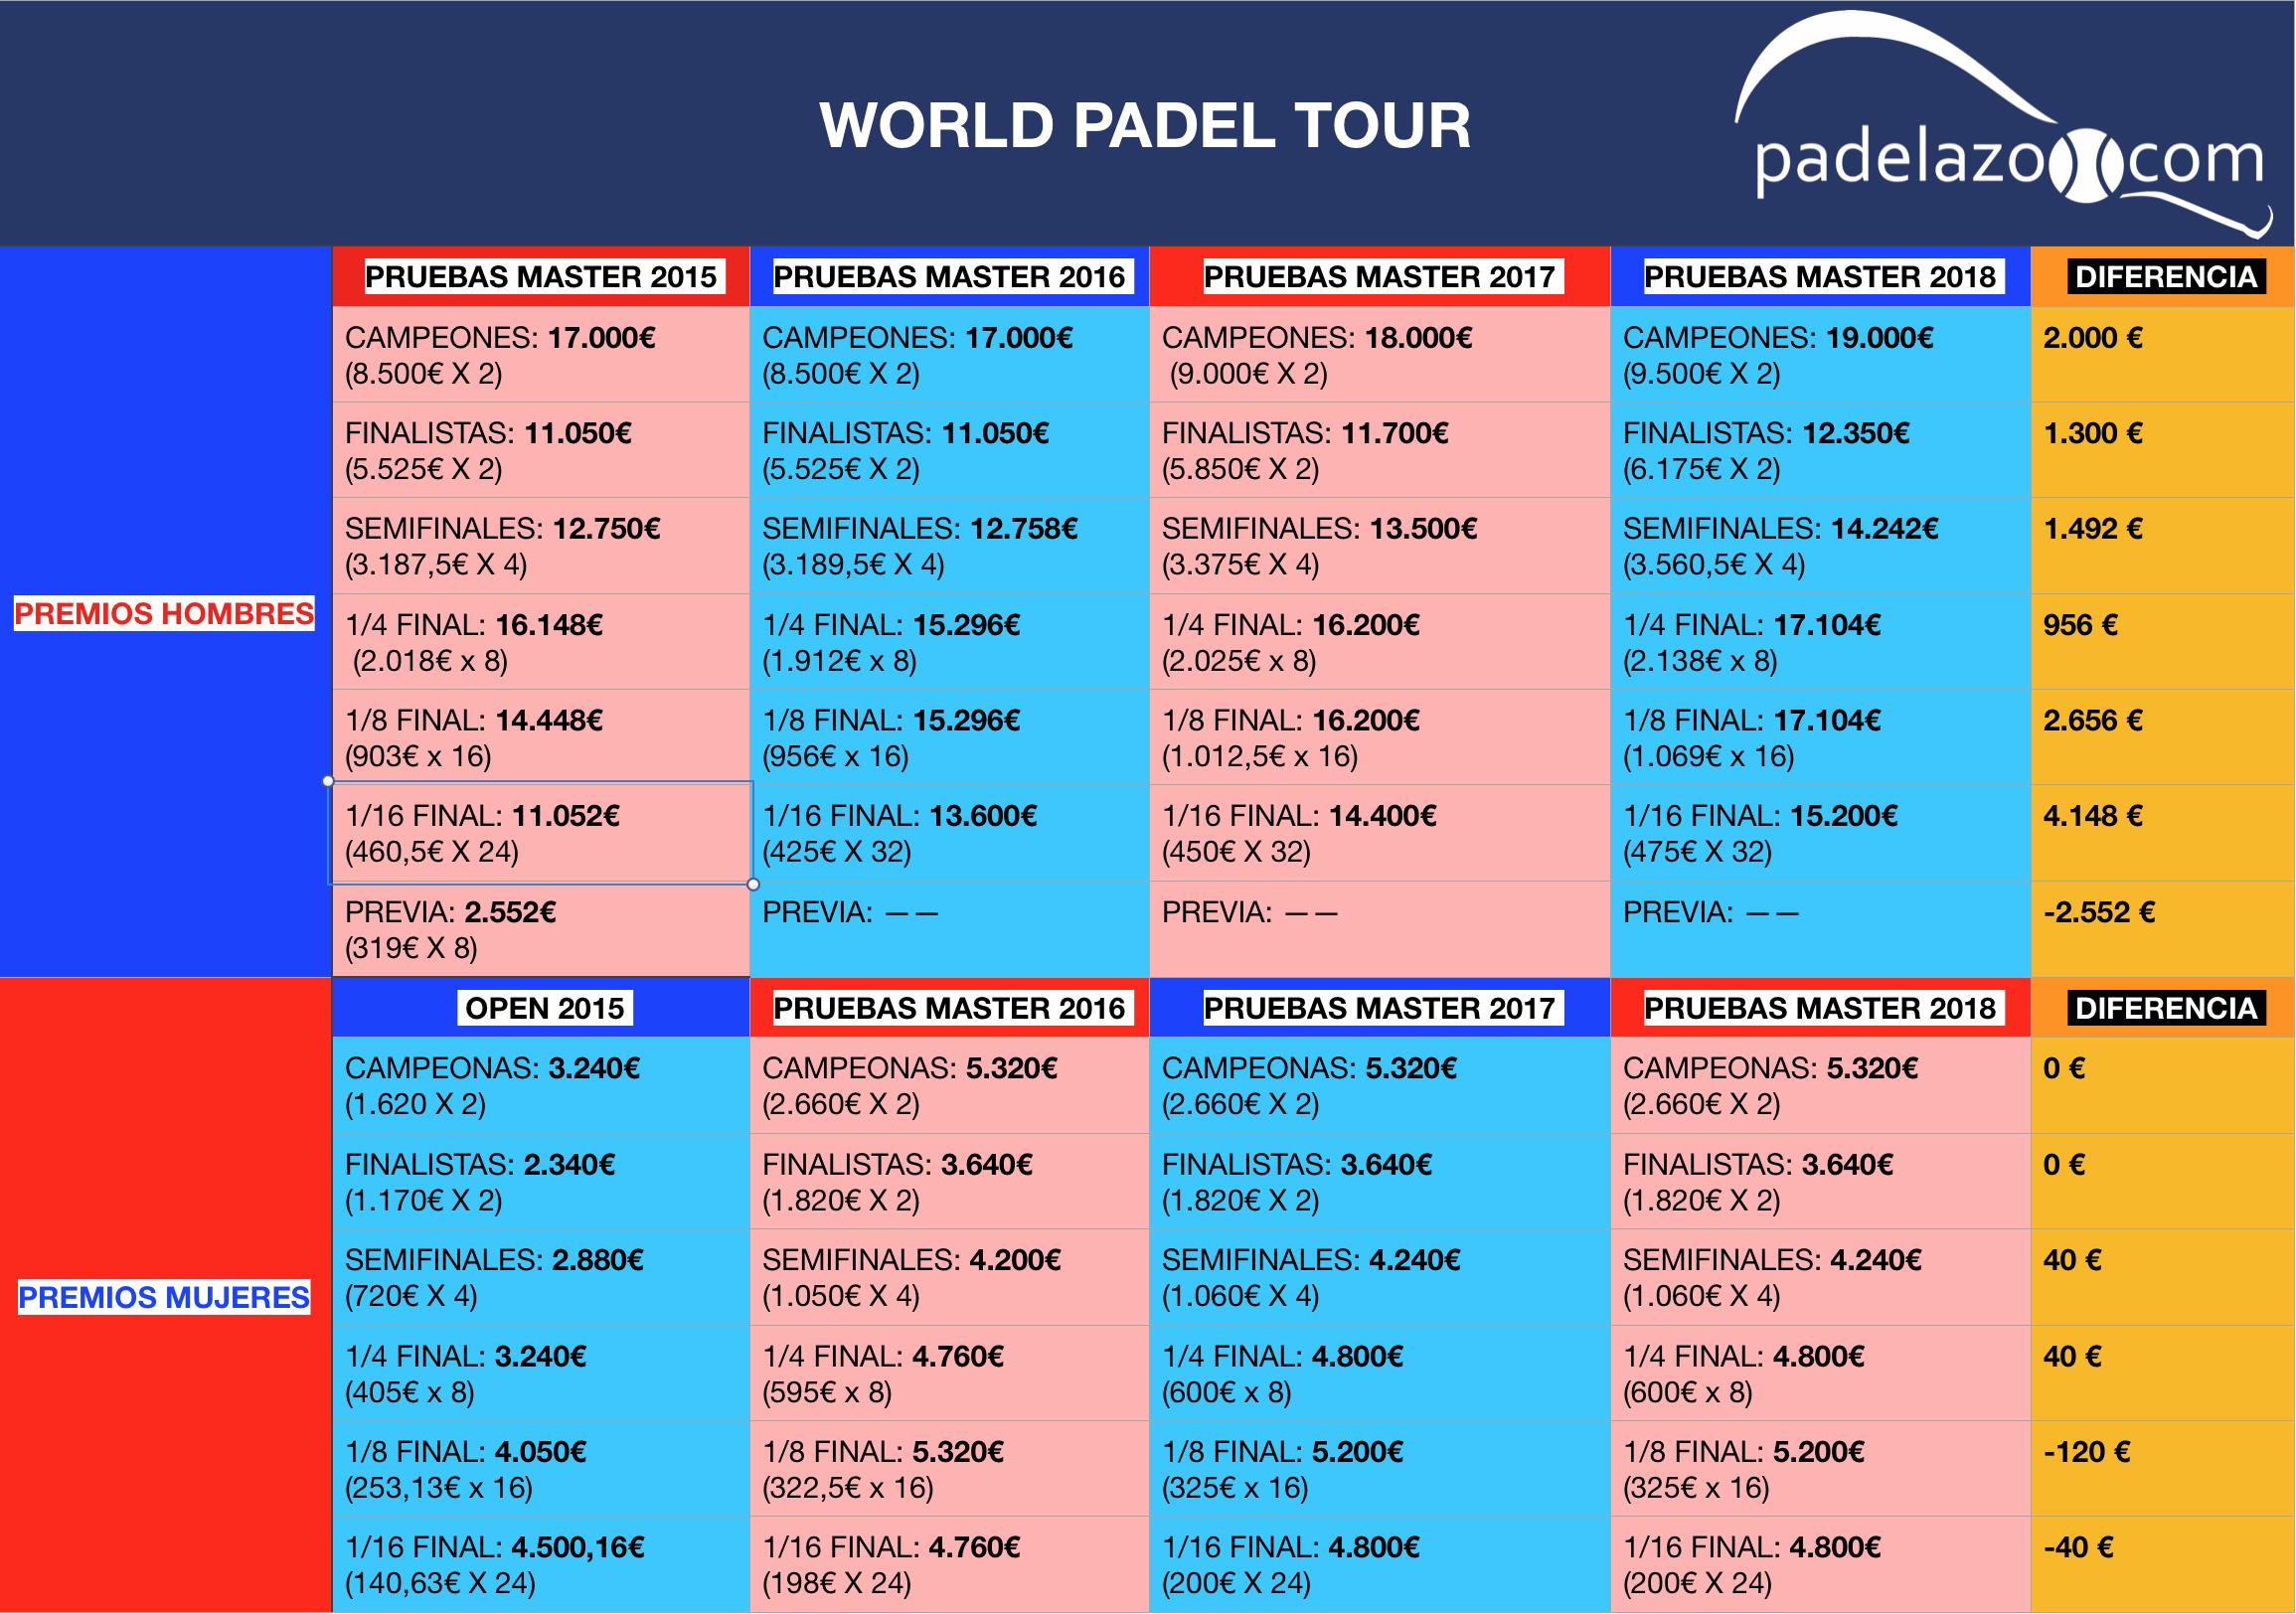 comparativa premios pruebas master world padel tour masculino y femenino 2018